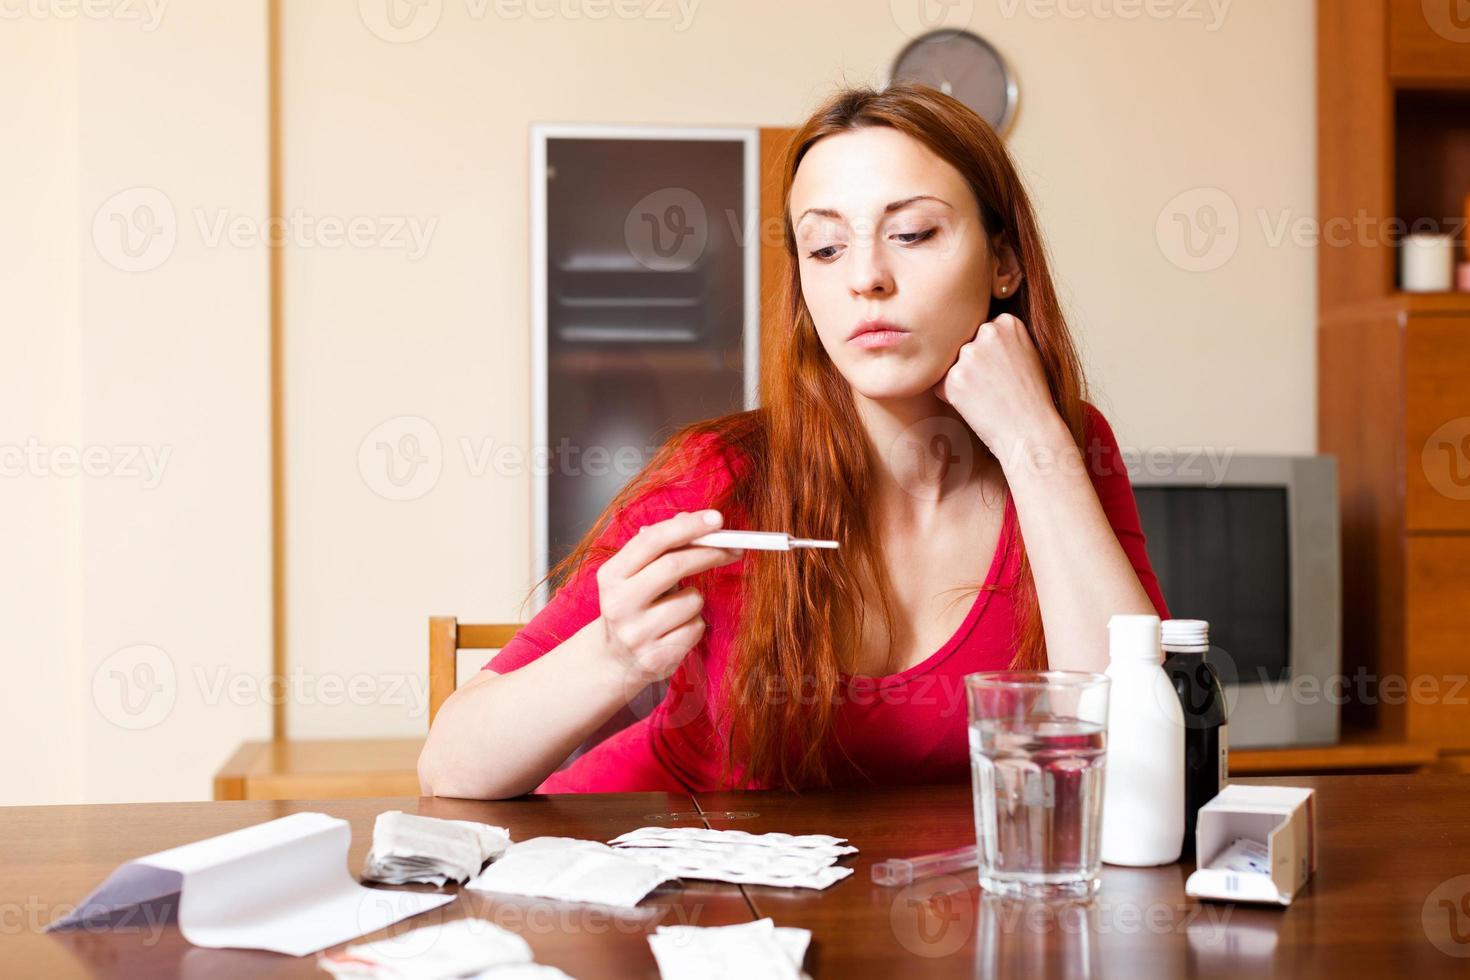 triest vrouw met thermometer in de woonkamer thuis foto